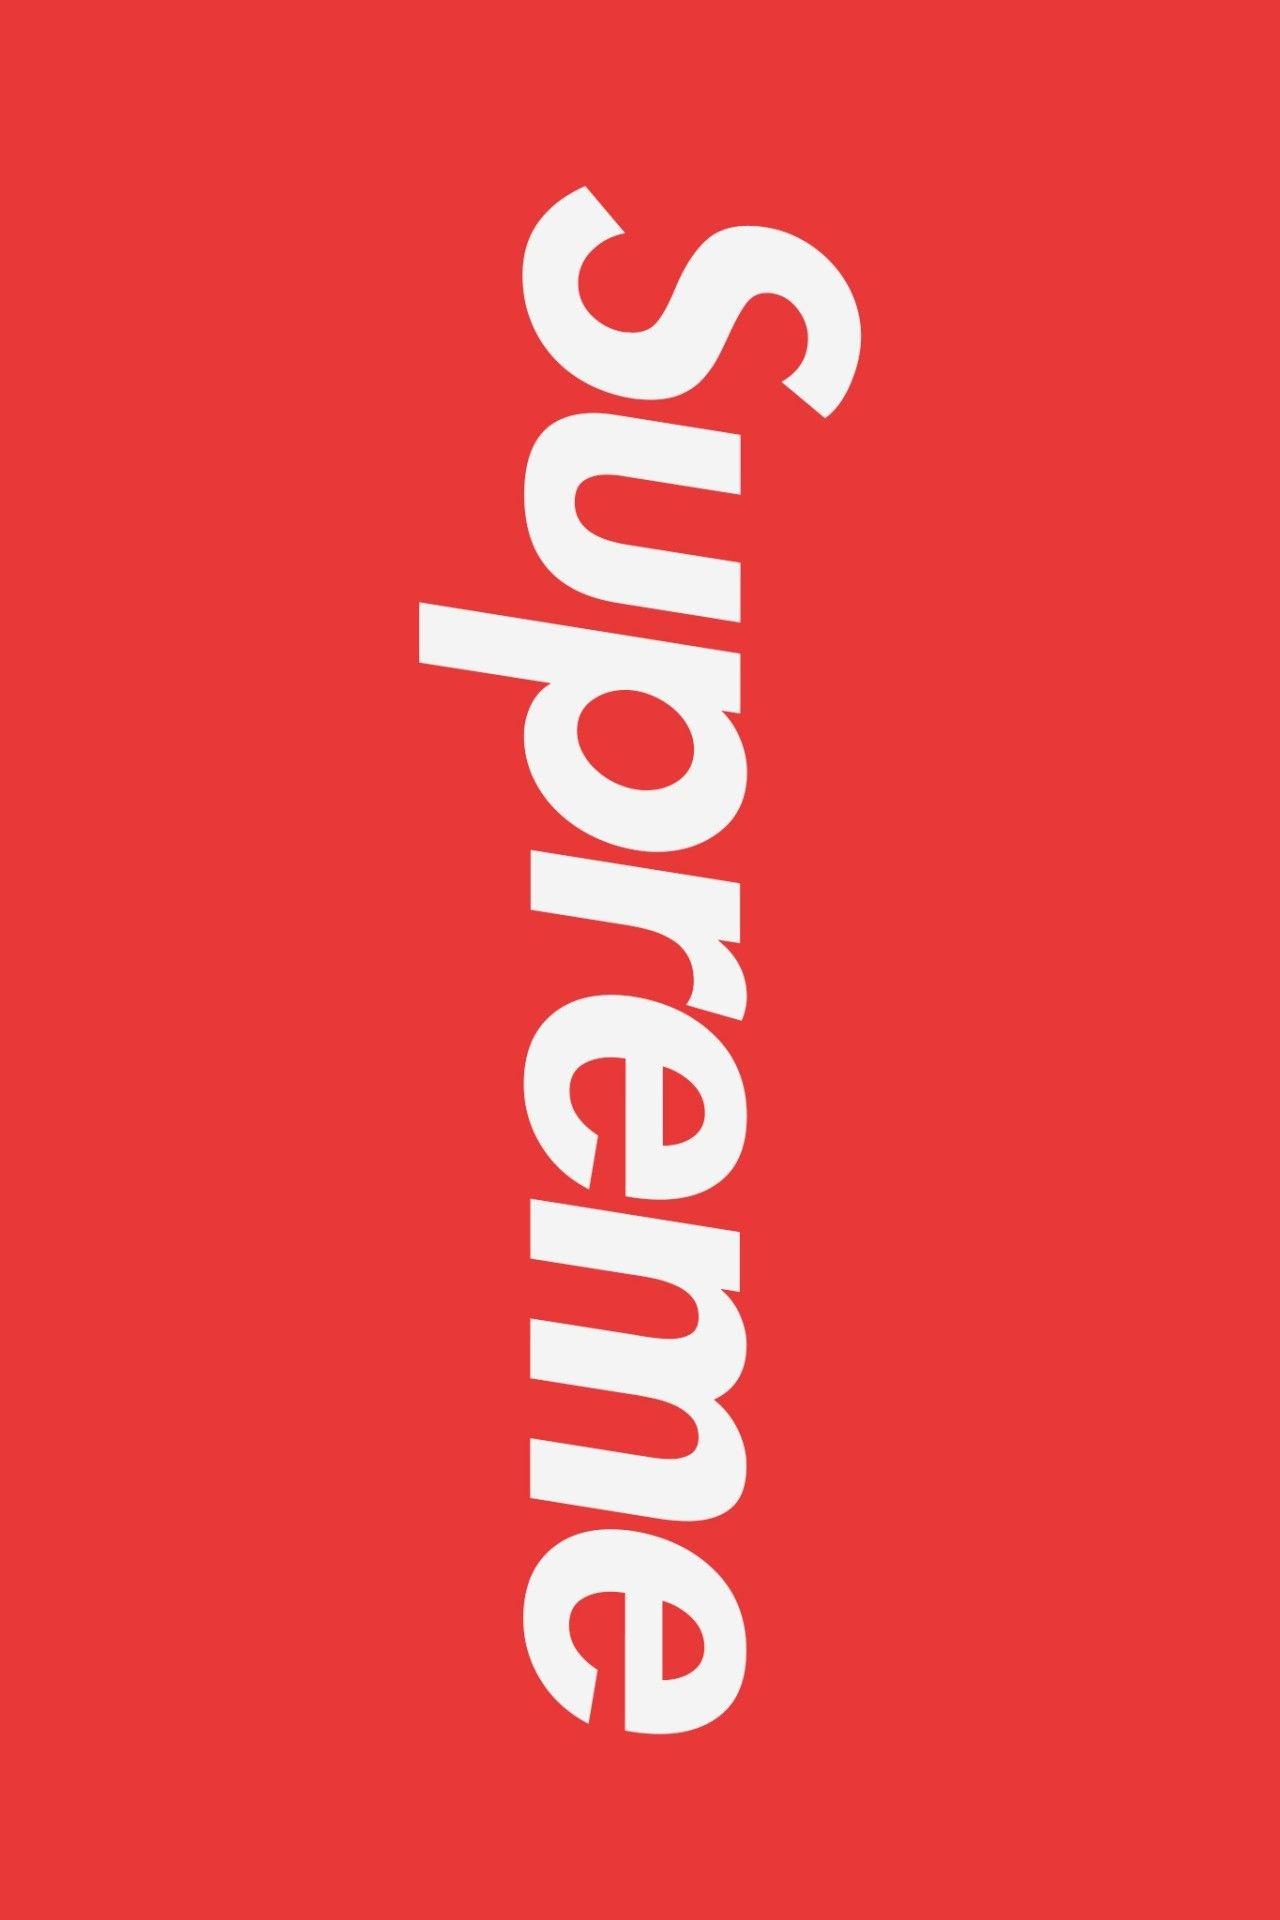 Pin by Nik Perko on sheed Supreme logo, Supreme iphone